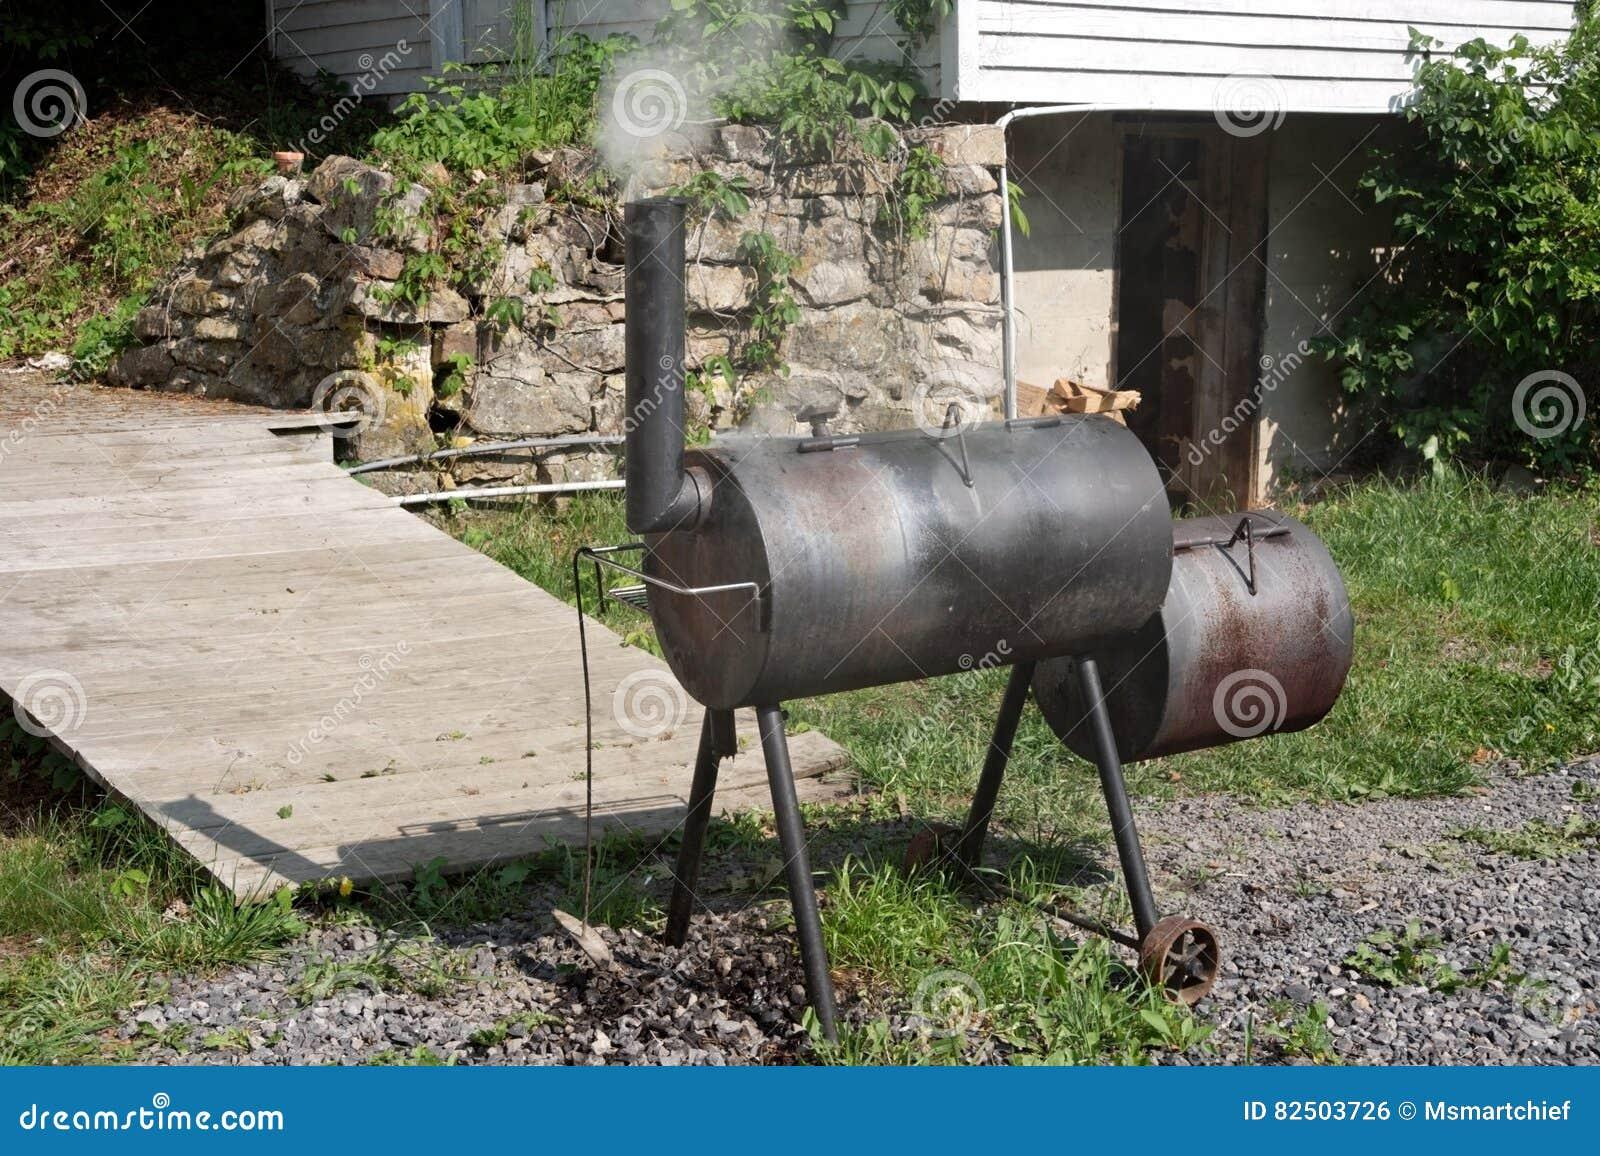 Homemade Bbq Smoker Stock Photo Image Of Homemade Smoker 82503726